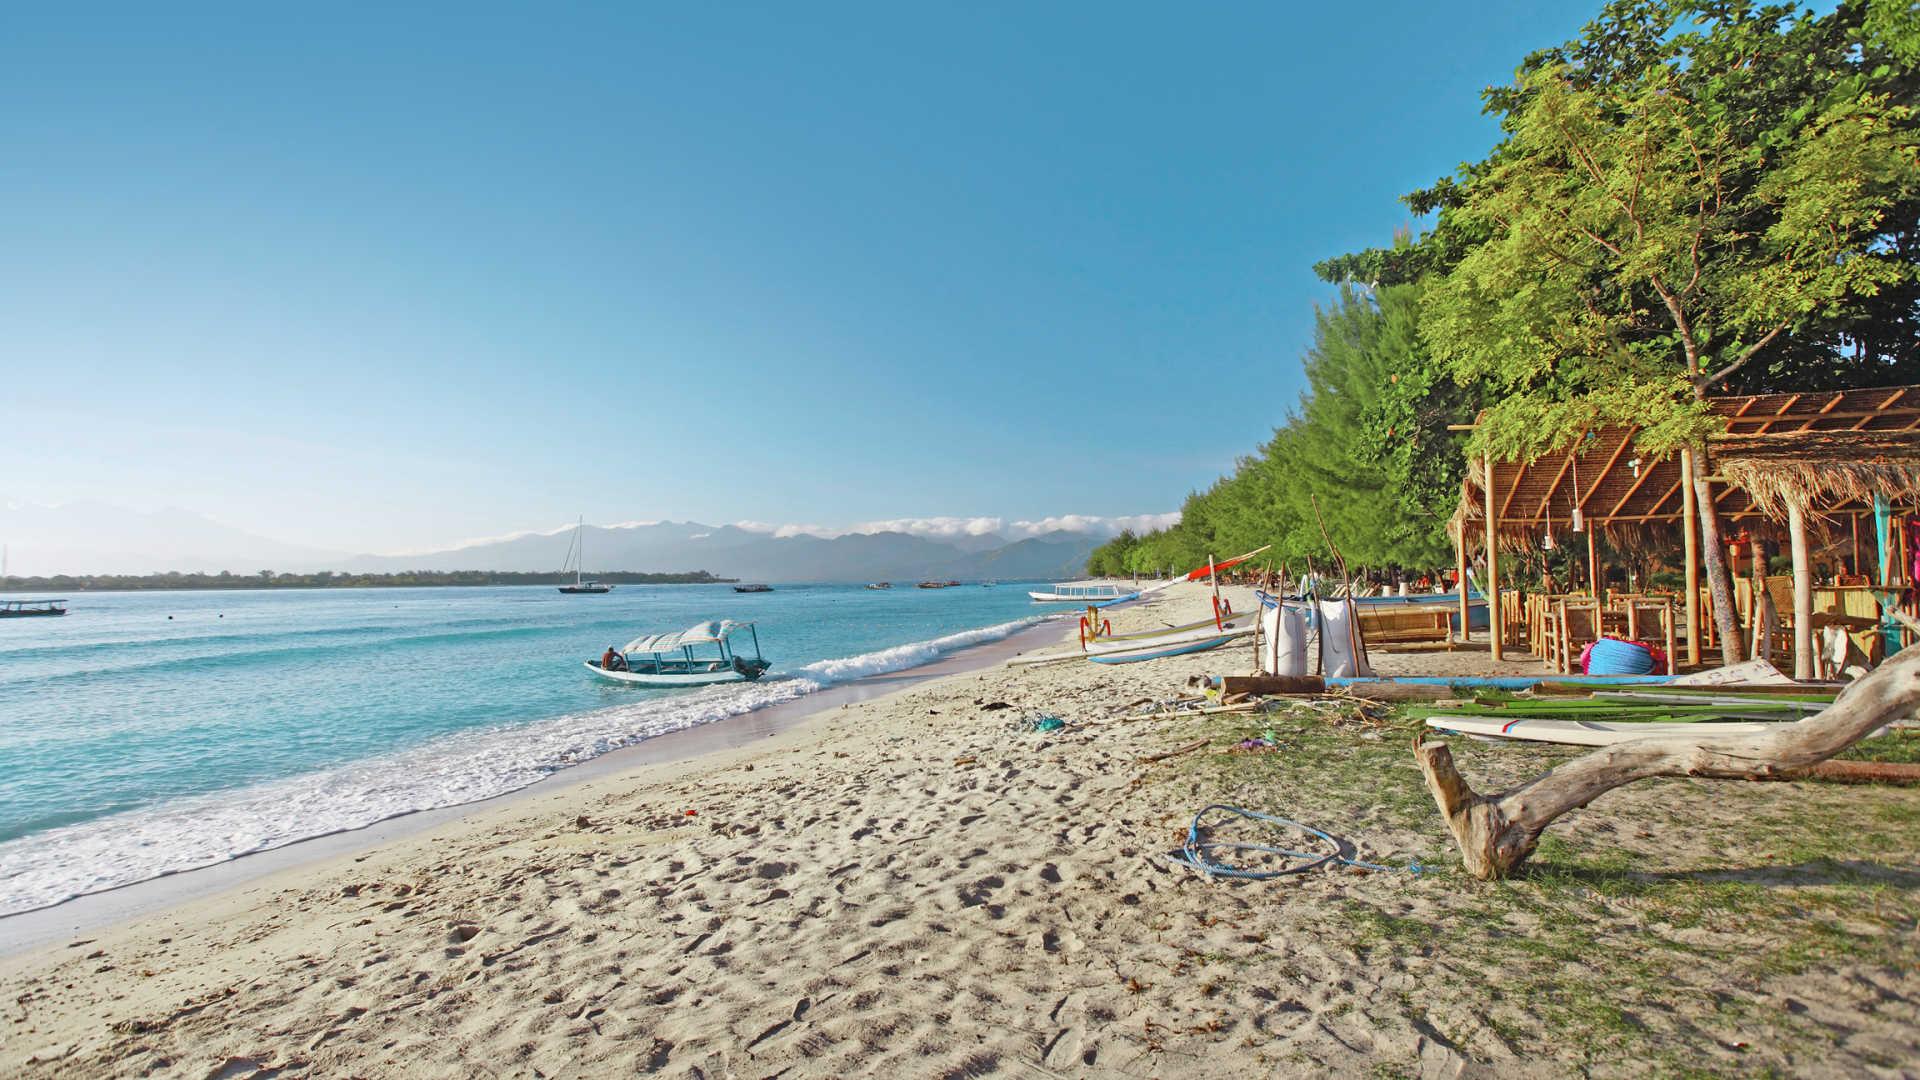 lombok-and-gili-islands-34834492-1482324123-ImageGalleryLightboxLarge.jpg